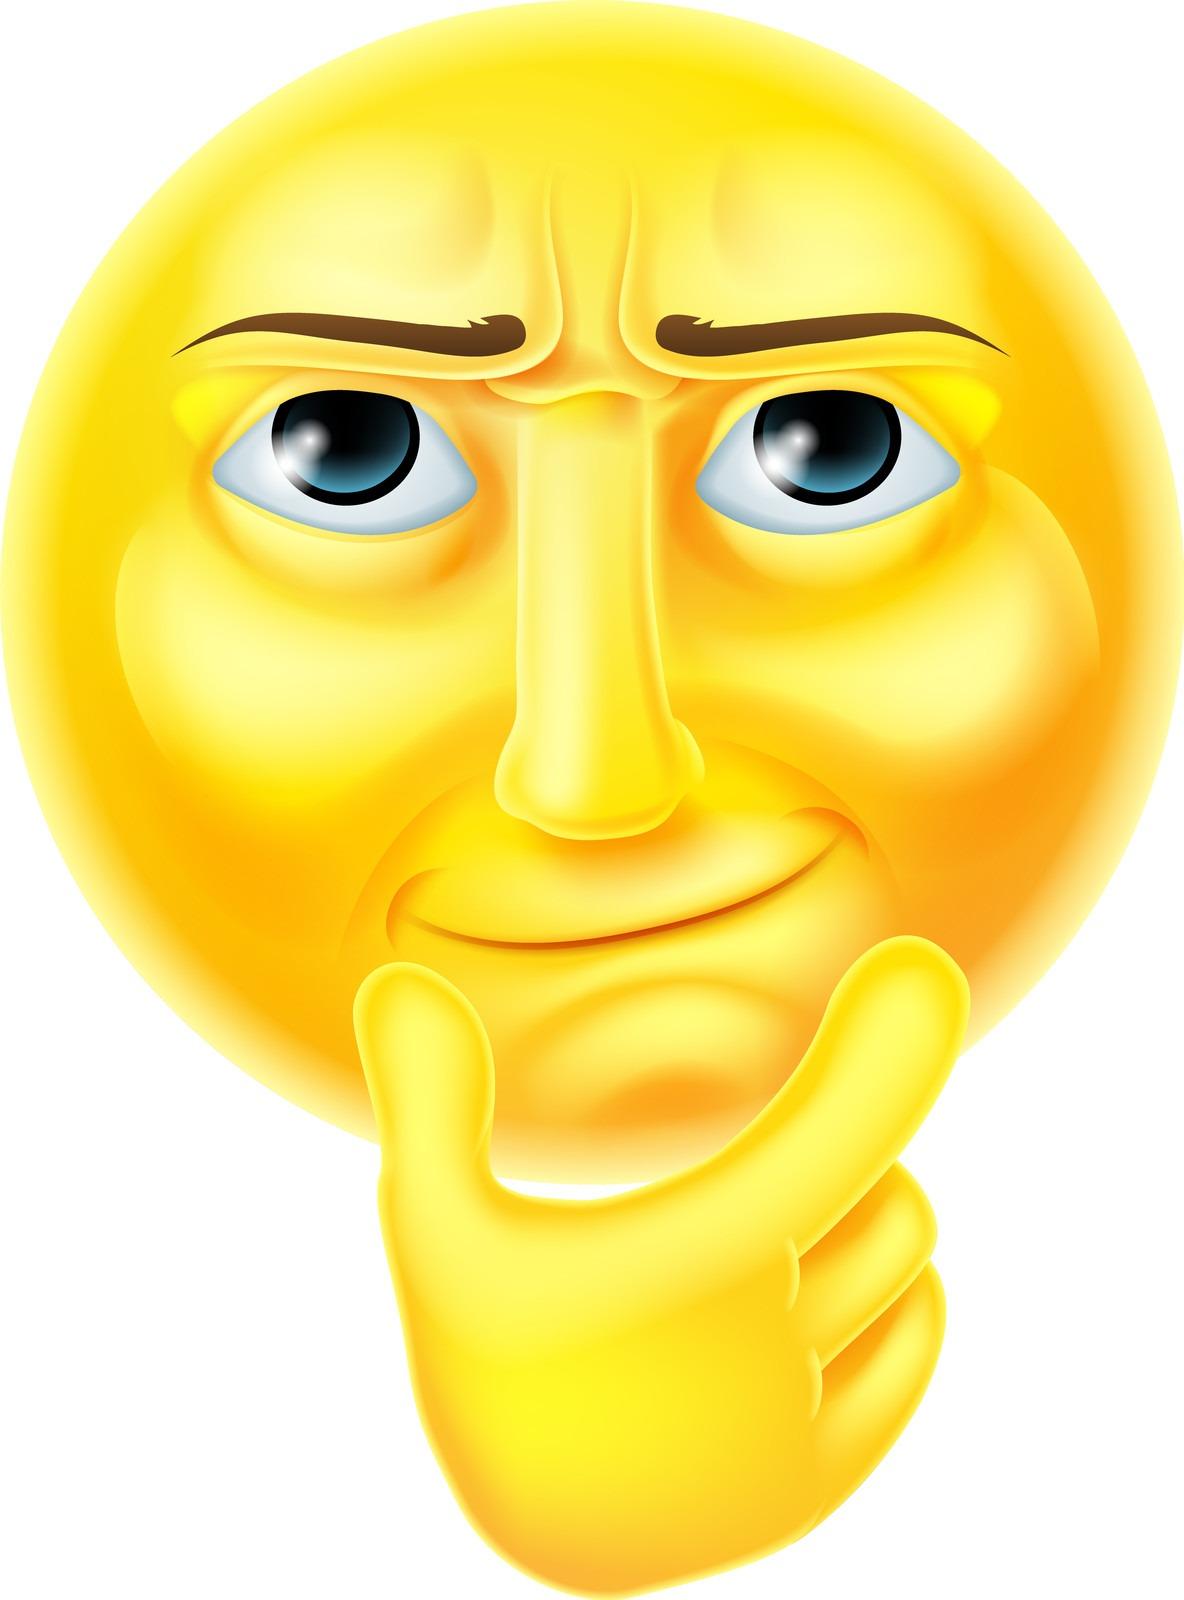 thinking emogi